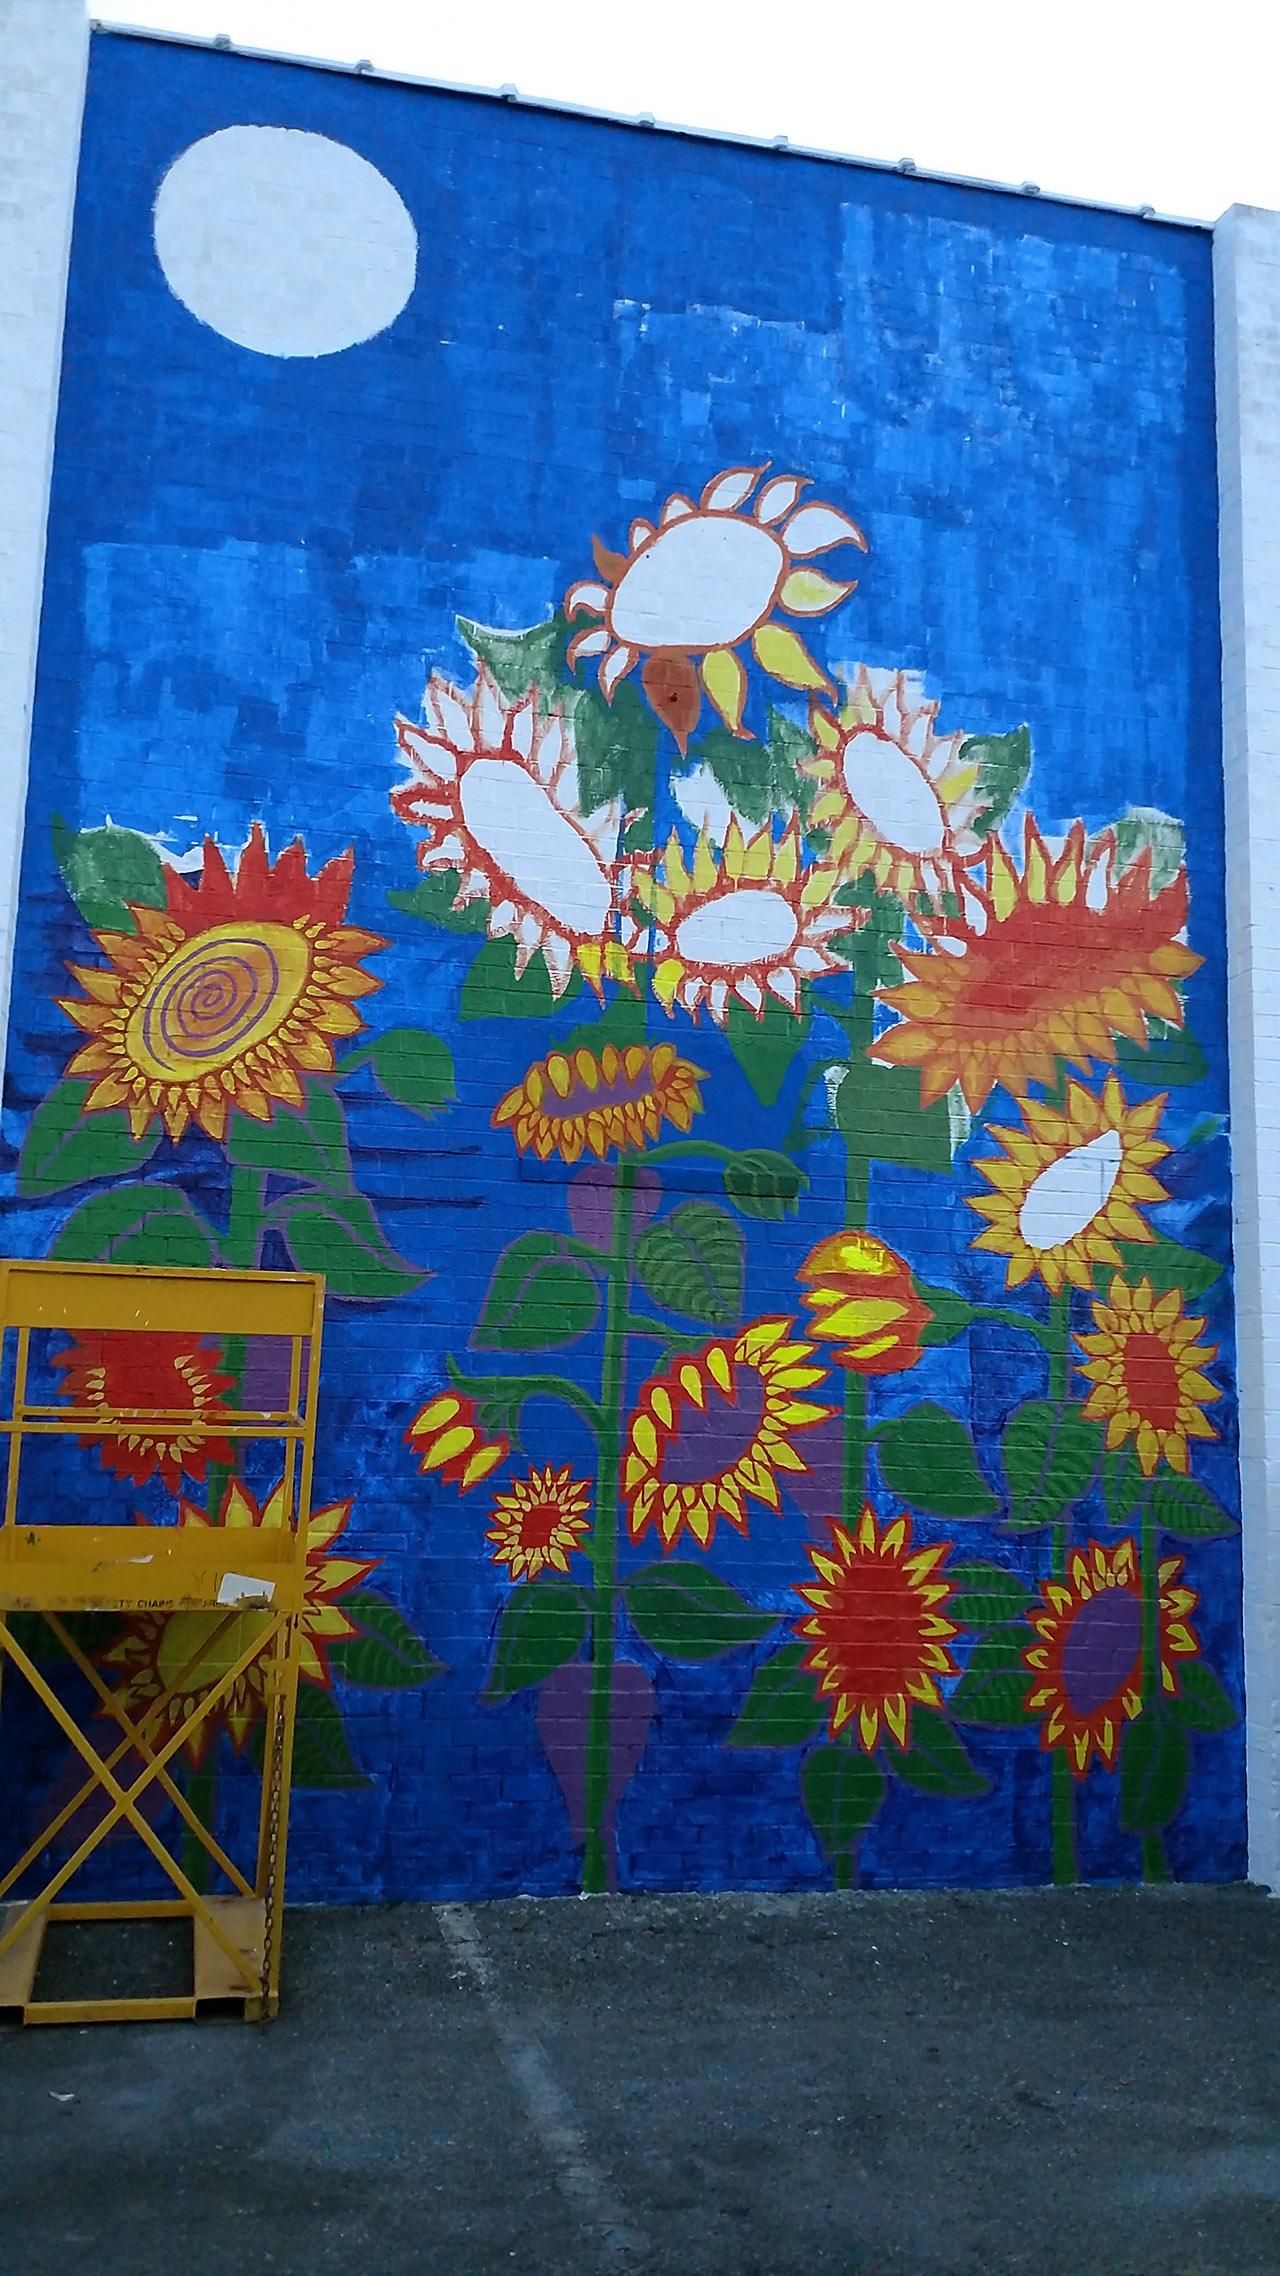 Sunflowers-Mural-Brenda-Kato043